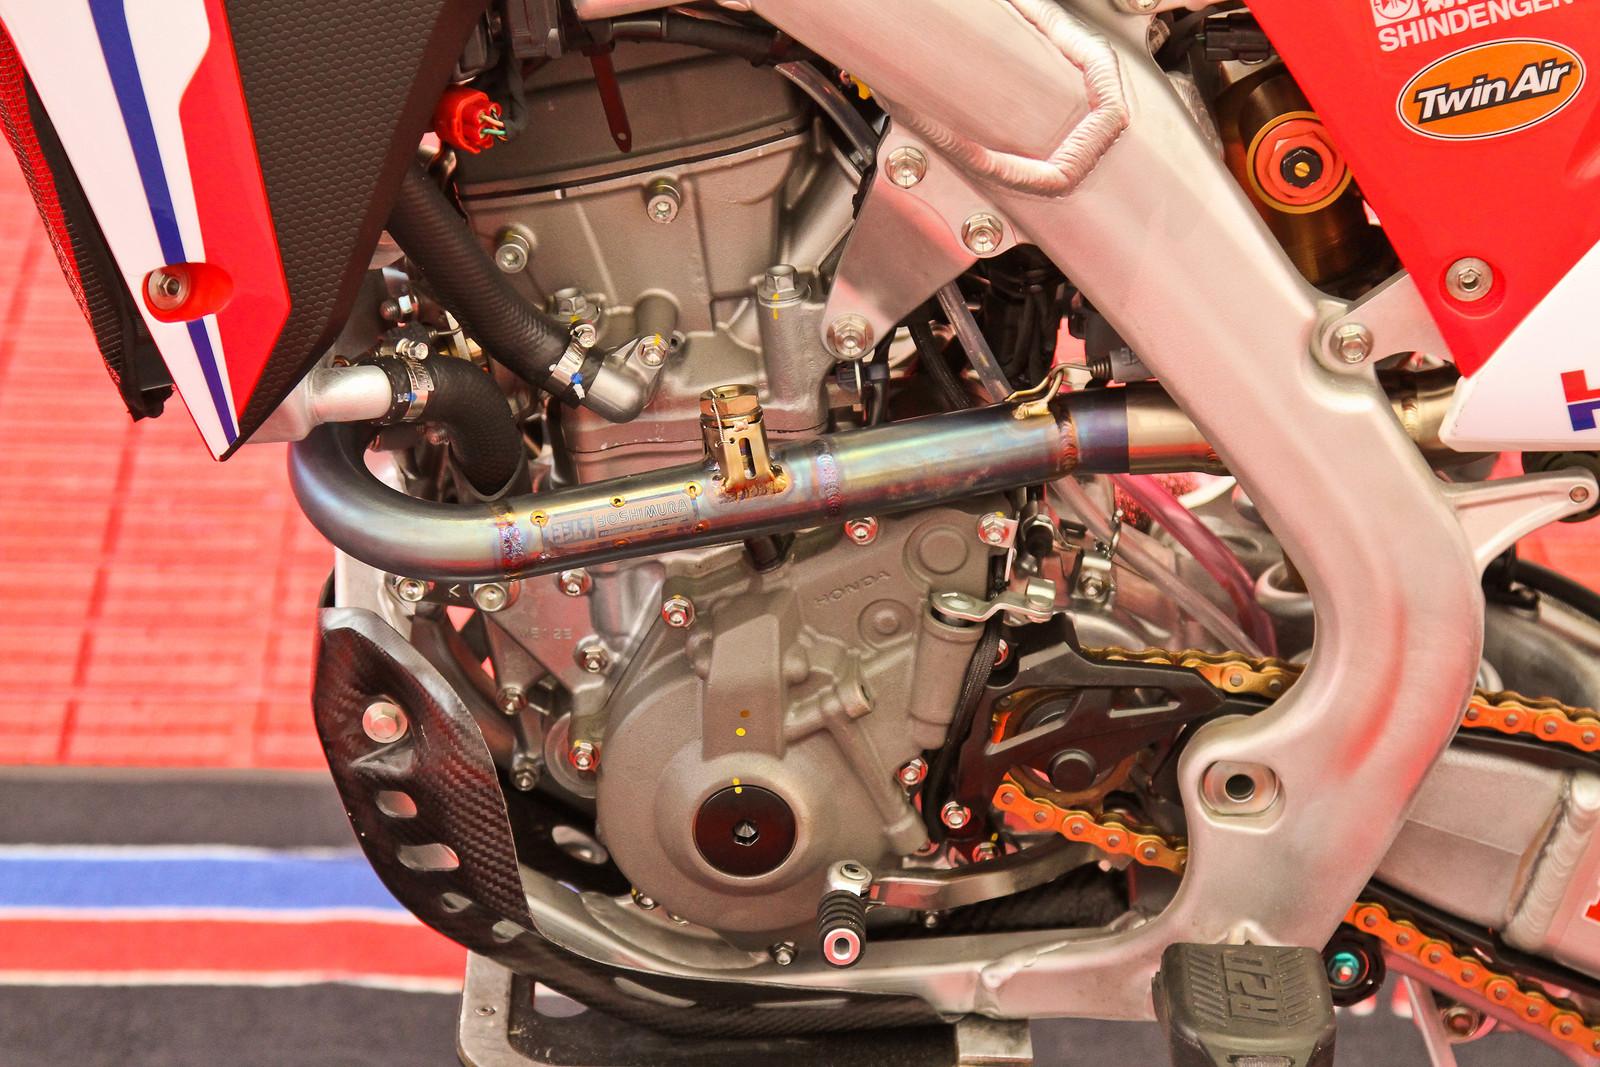 2018 Honda CRF250RW - Engine Left Side - ayearinmx - Motocross Pictures - Vital MX